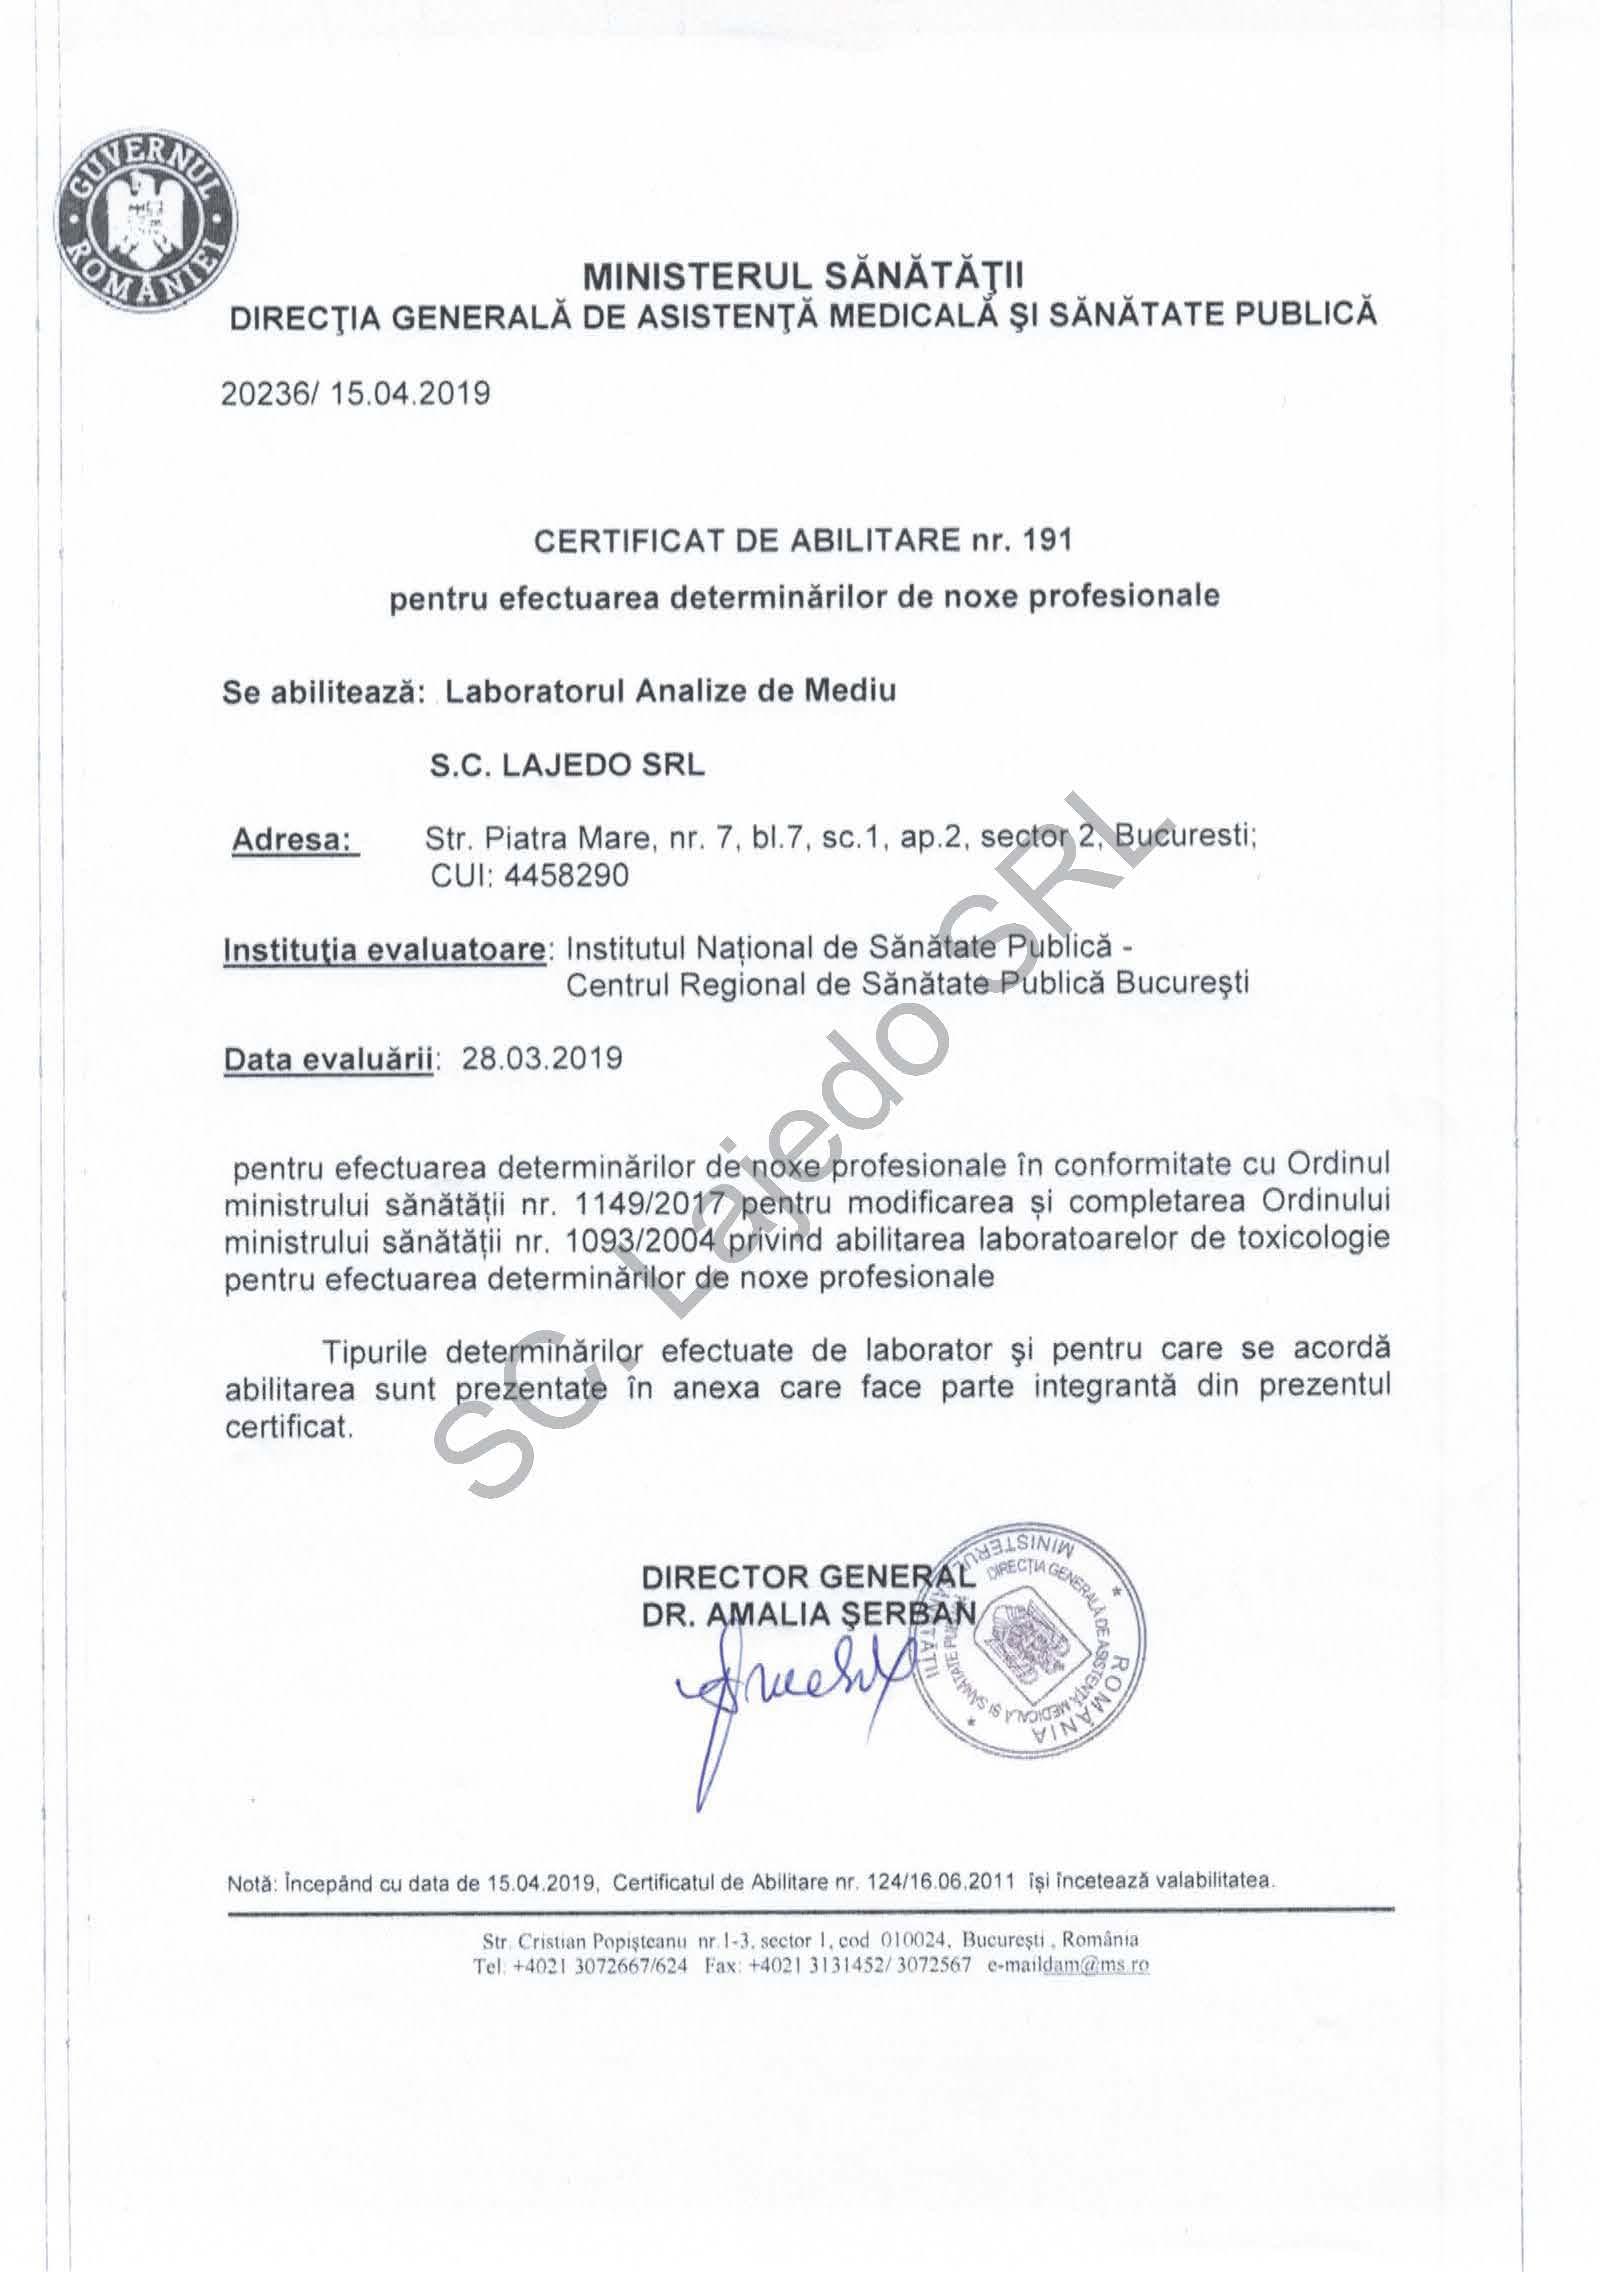 Certificat abilitare Noxe Profesionale